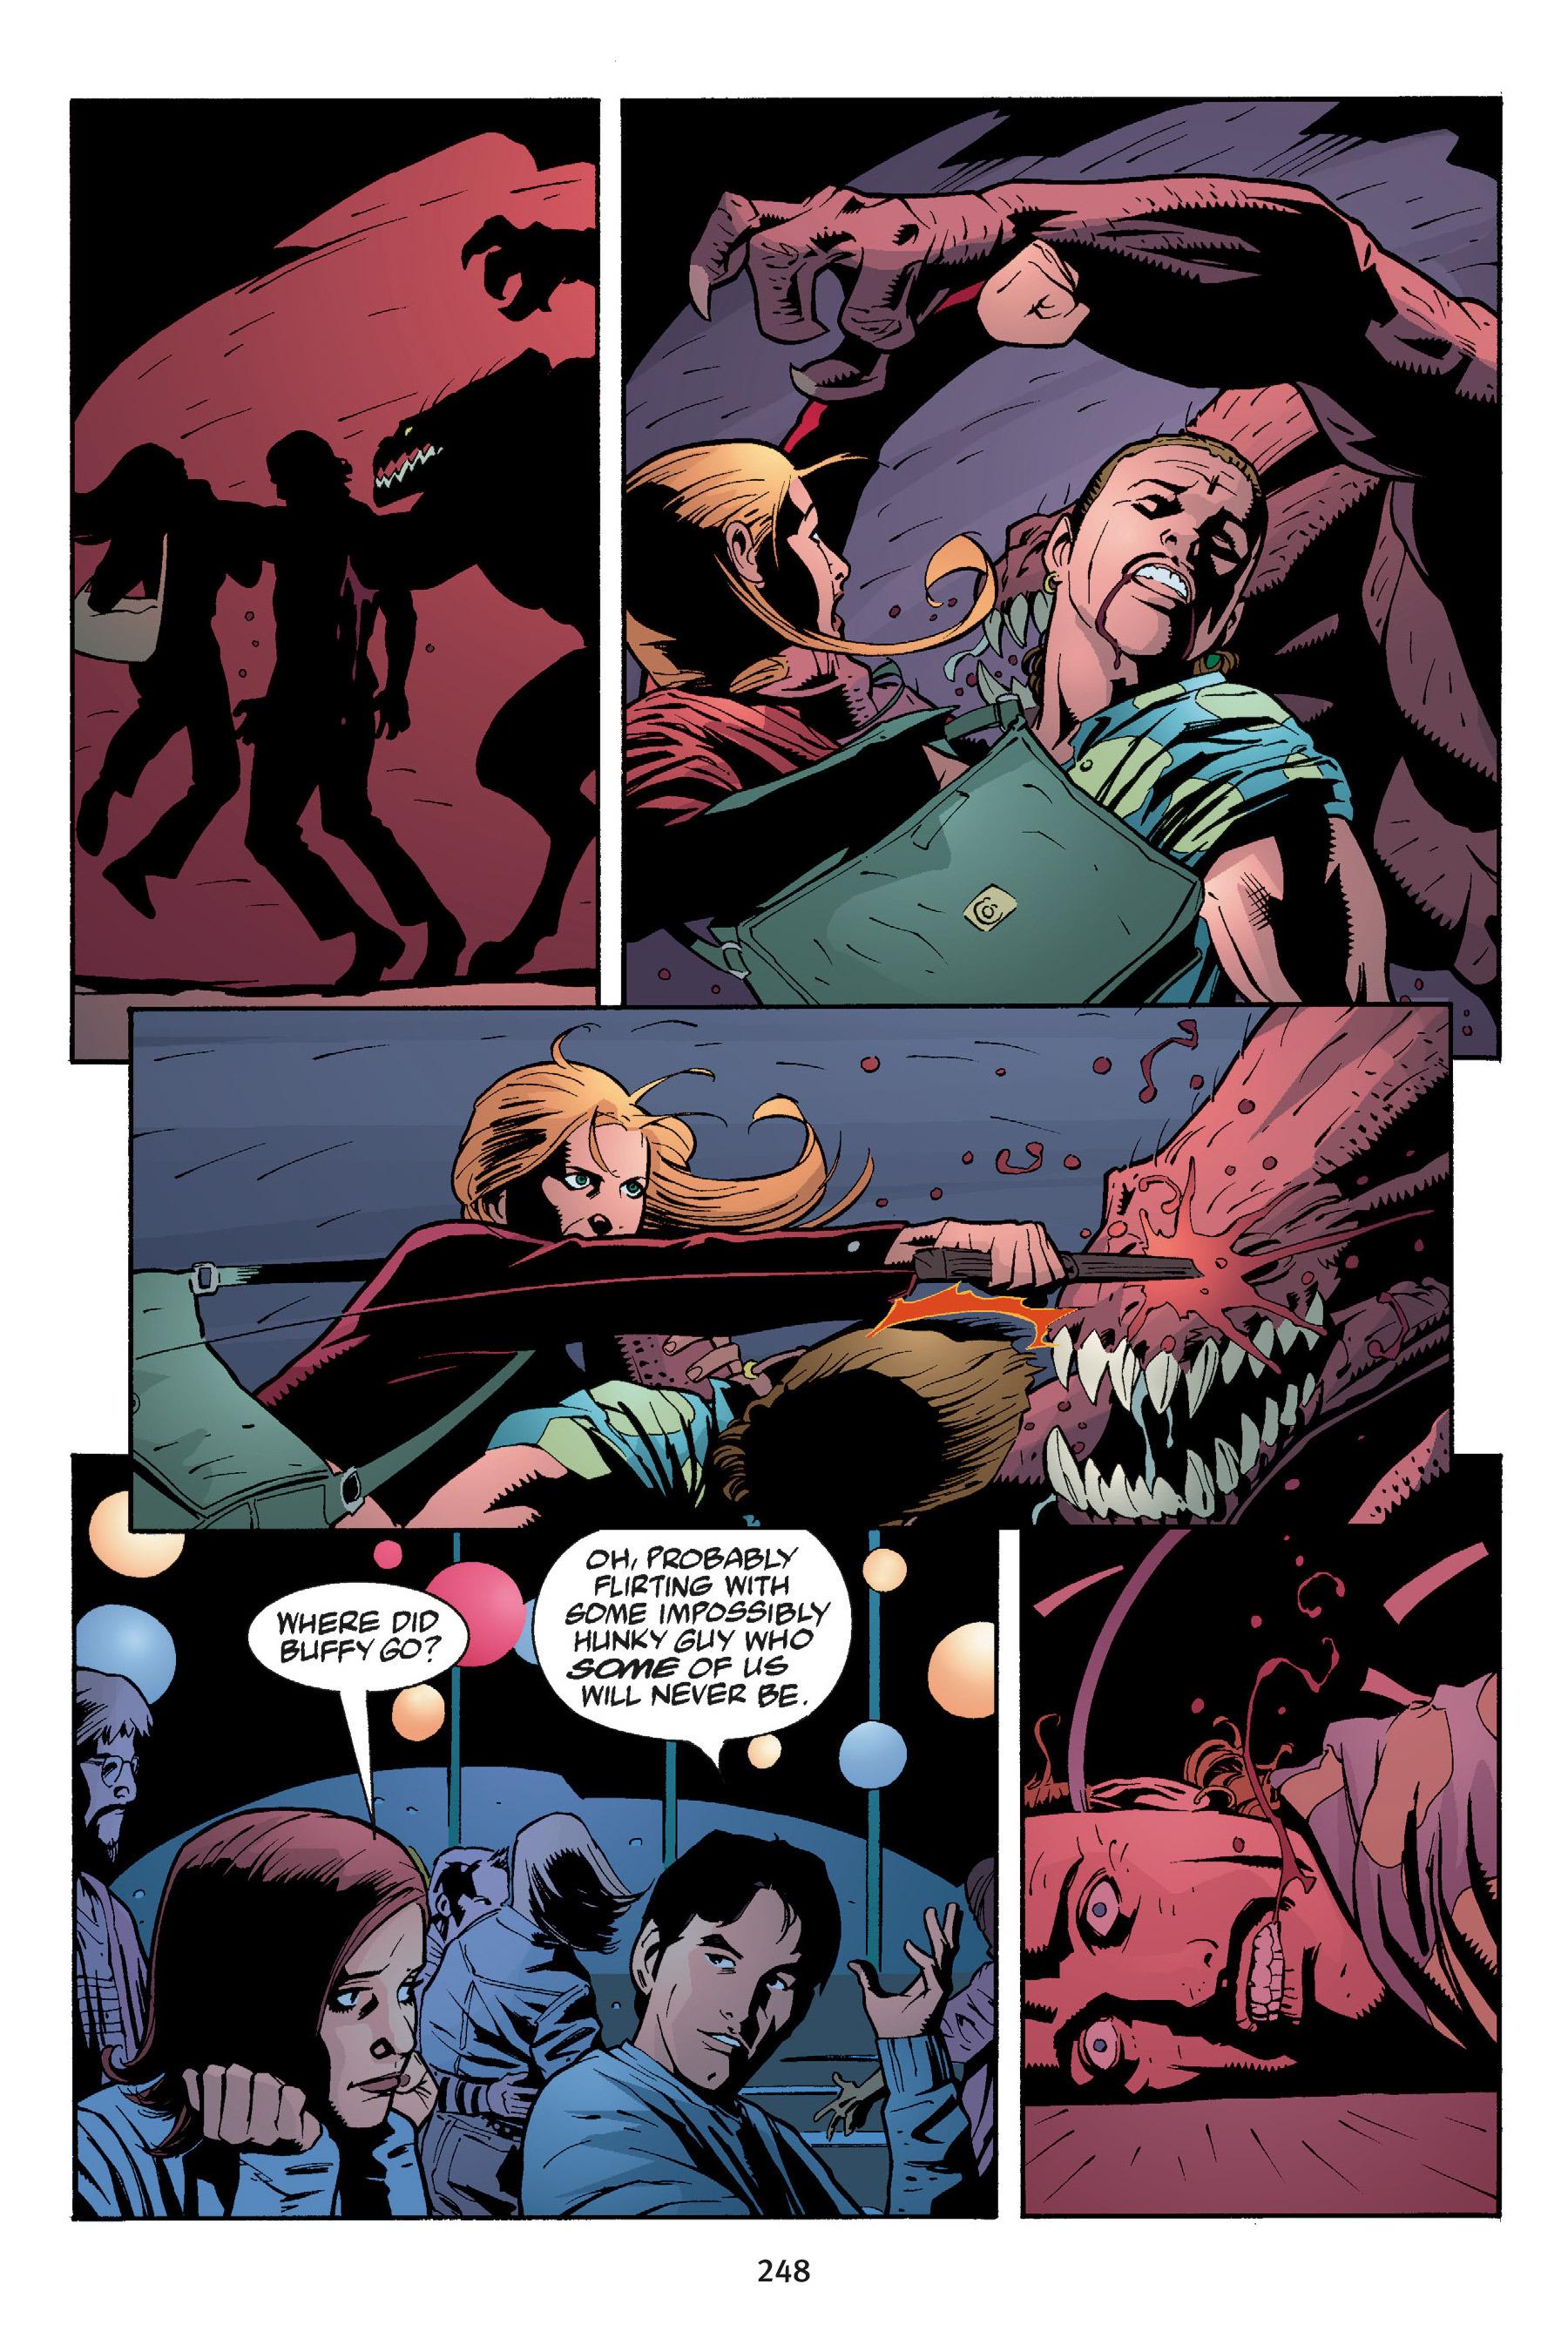 Read online Buffy the Vampire Slayer: Omnibus comic -  Issue # TPB 5 - 247